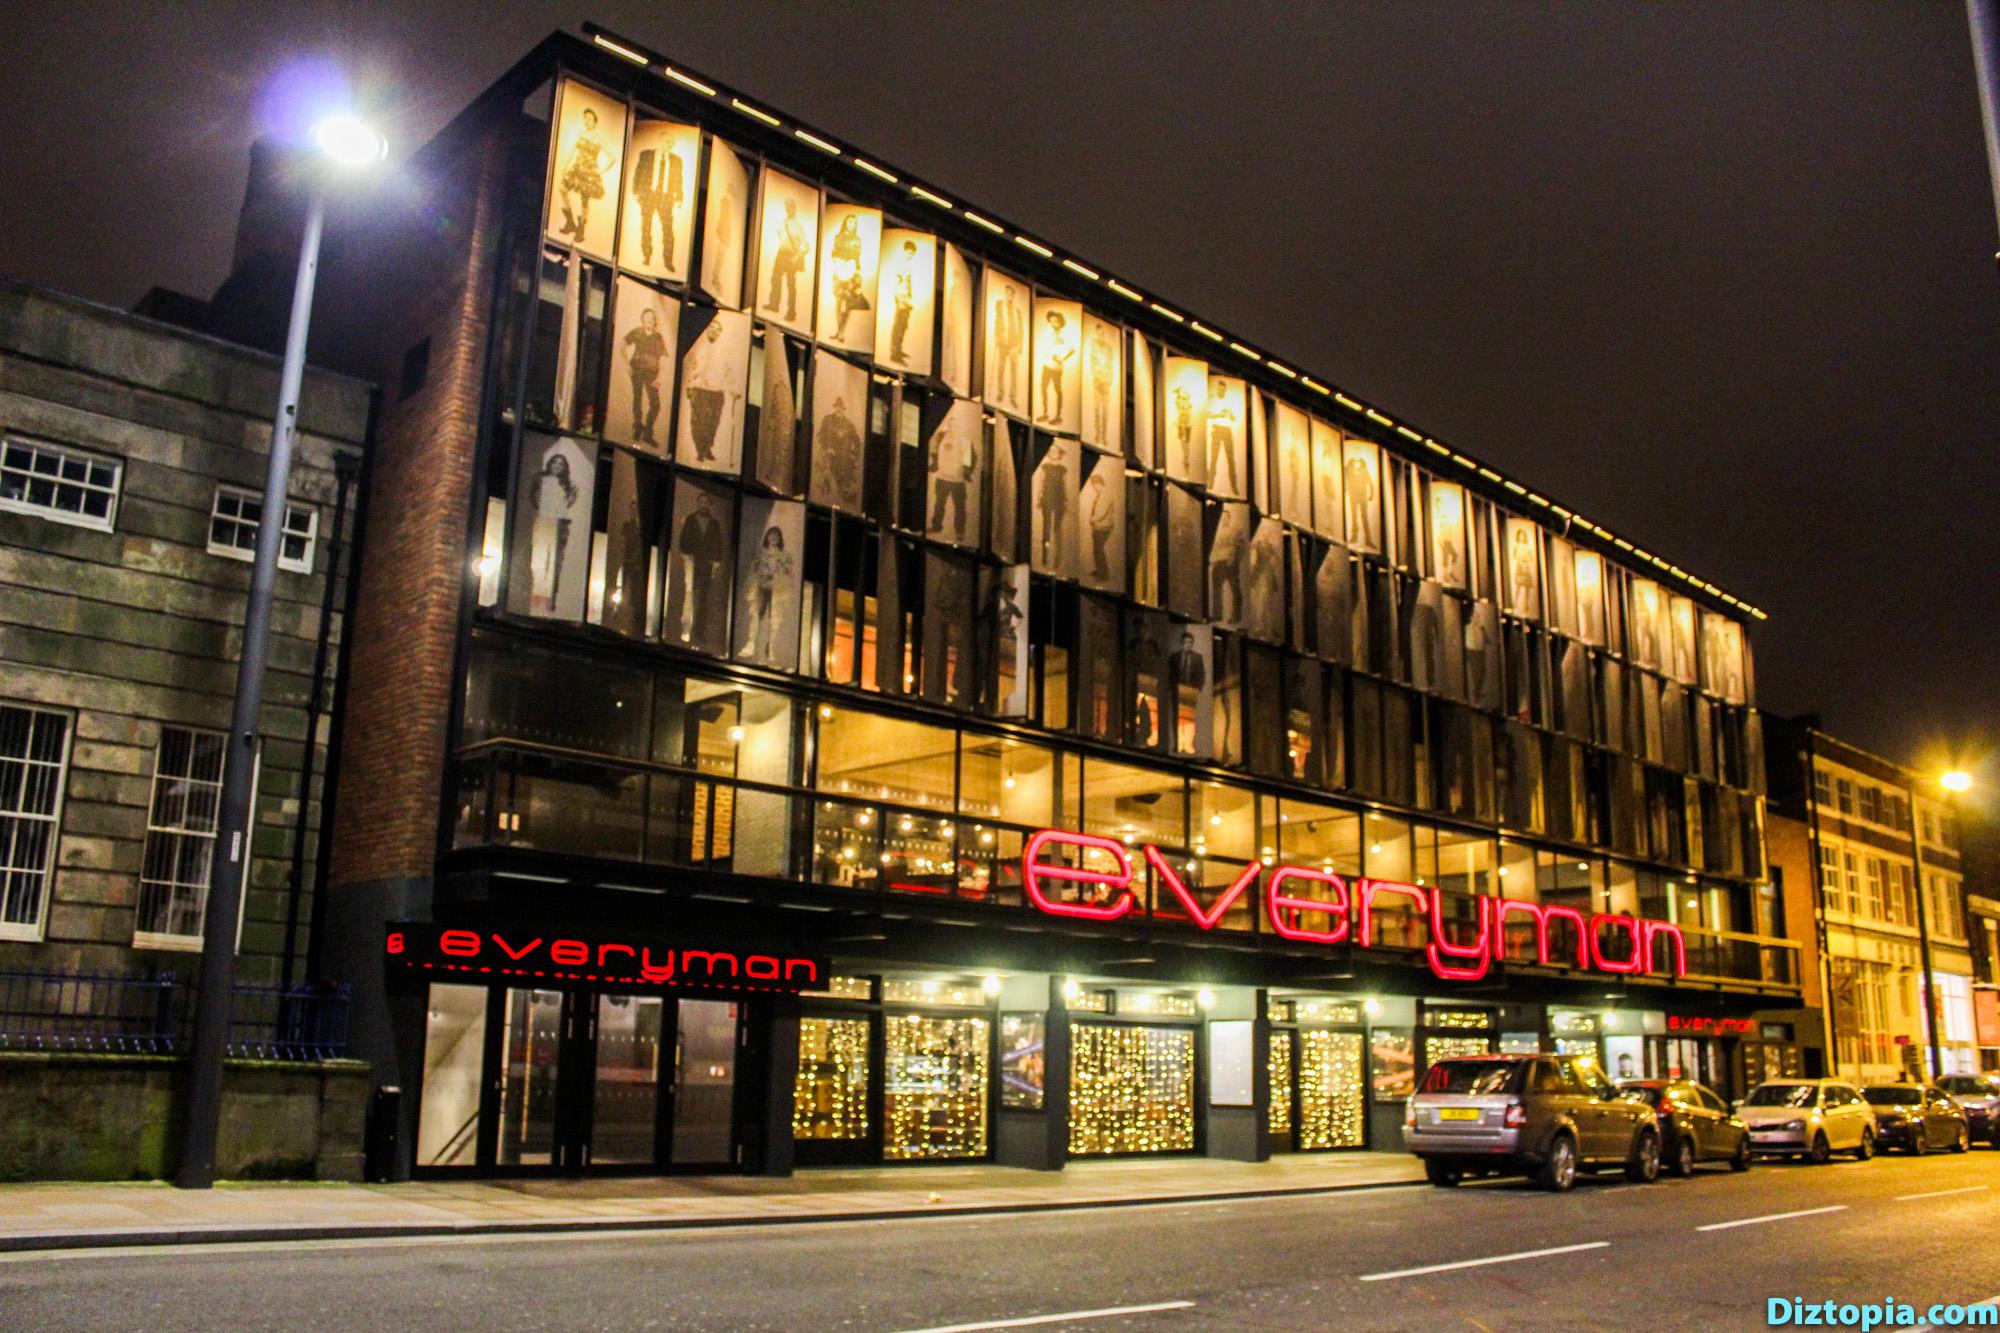 Liverpool-City-UK-Diztopia-Dizma-Dahl-Photography-2017-43-Centre-Heart-Night-Everyman-Theatre